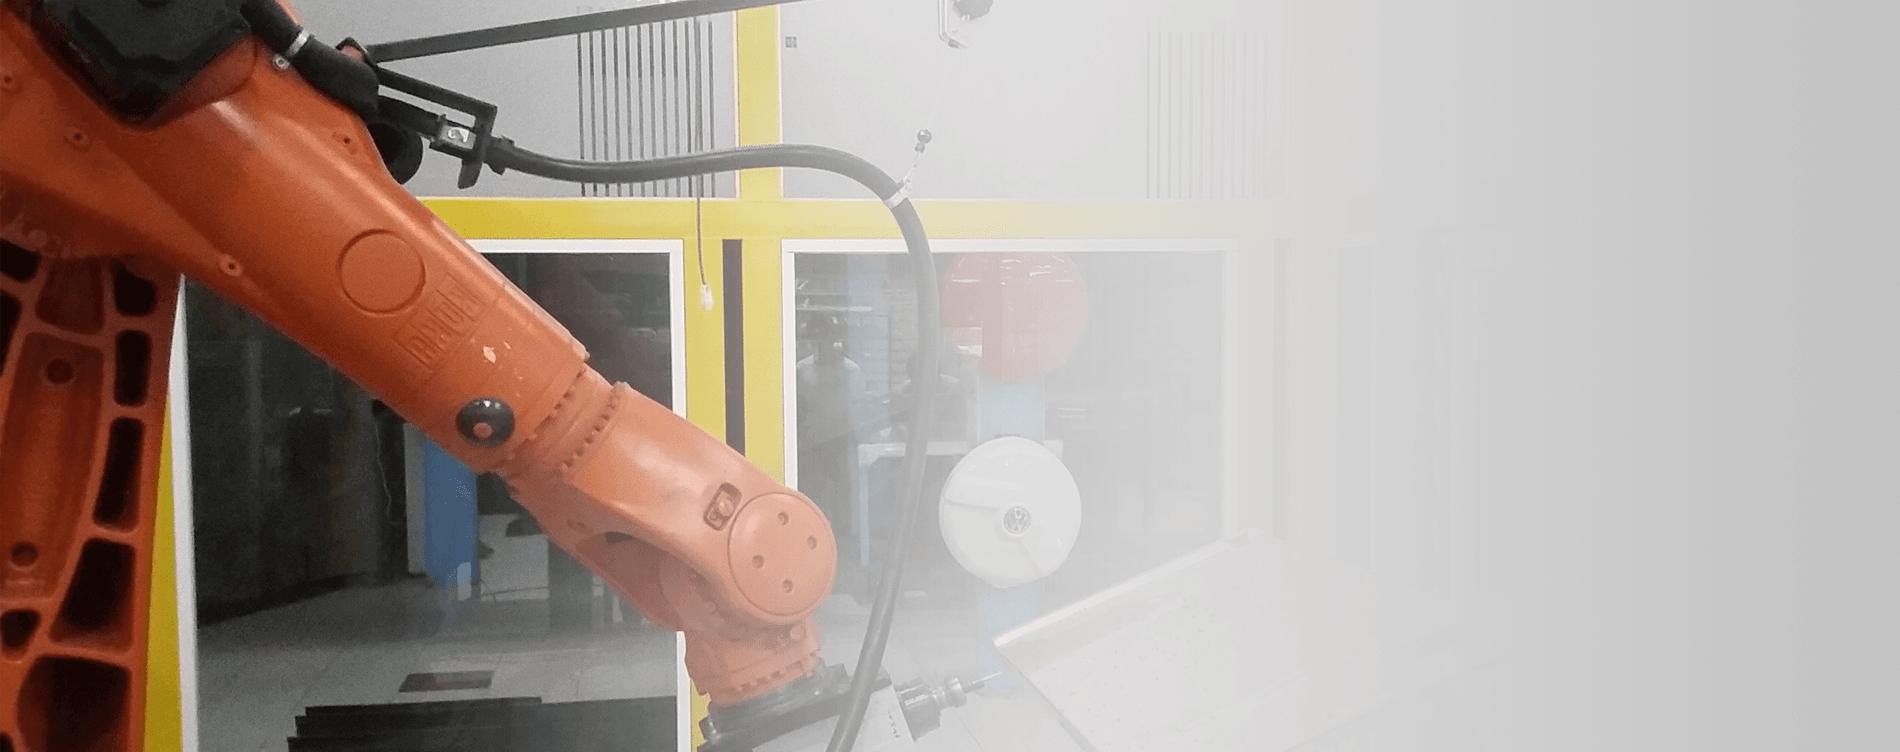 Robot automation service